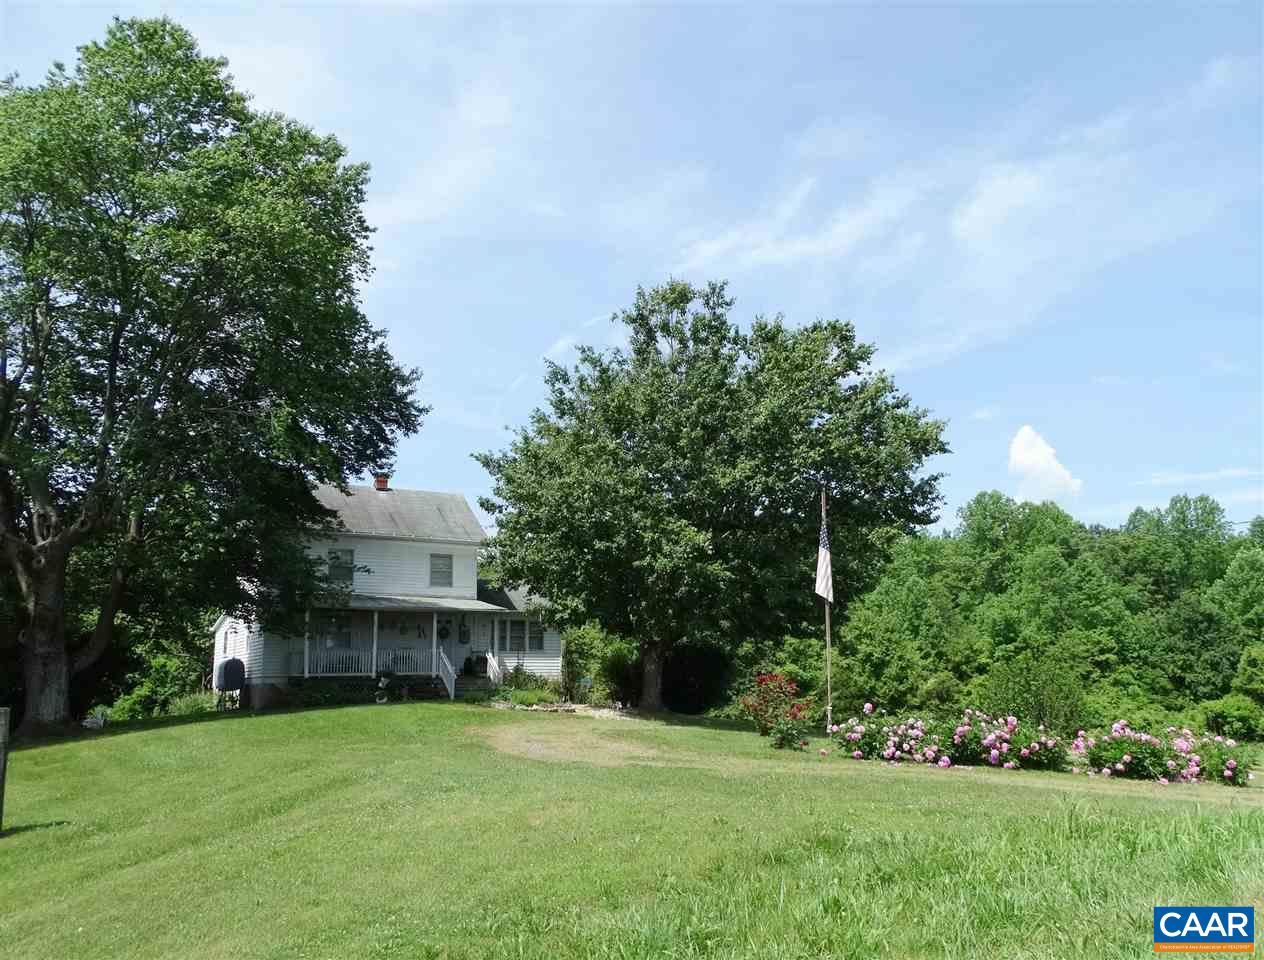 Single Family Home for Sale at 4253 S BLUE RIDGE TPK Rochelle, Virginia 22738 United States